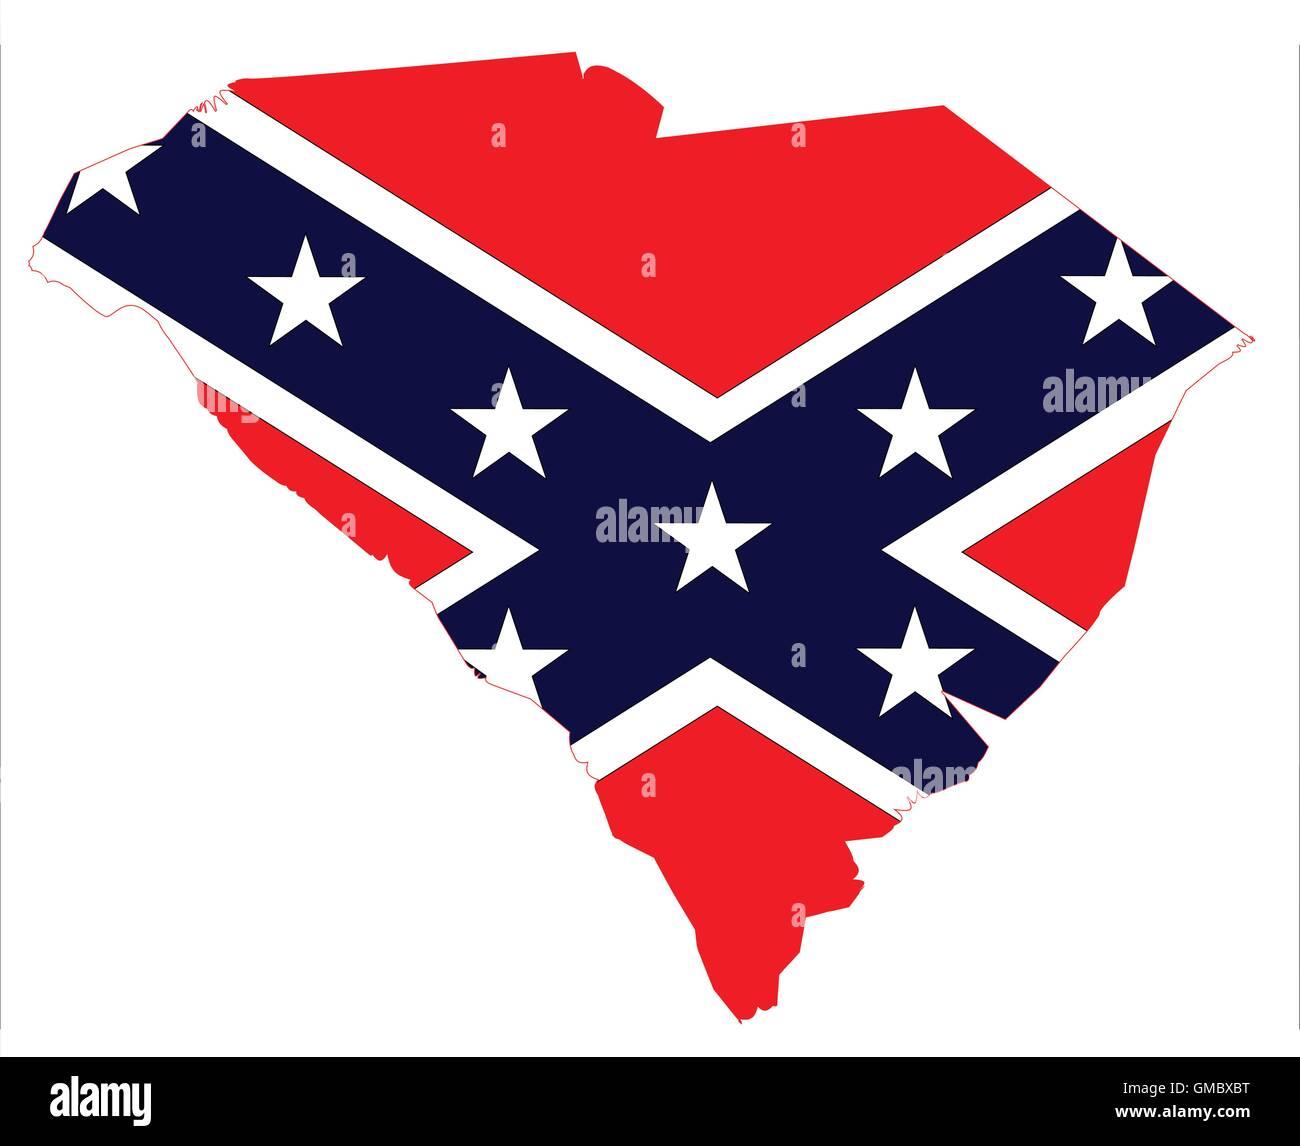 South Carolina Map And Confederate Flag Stock Vector Art